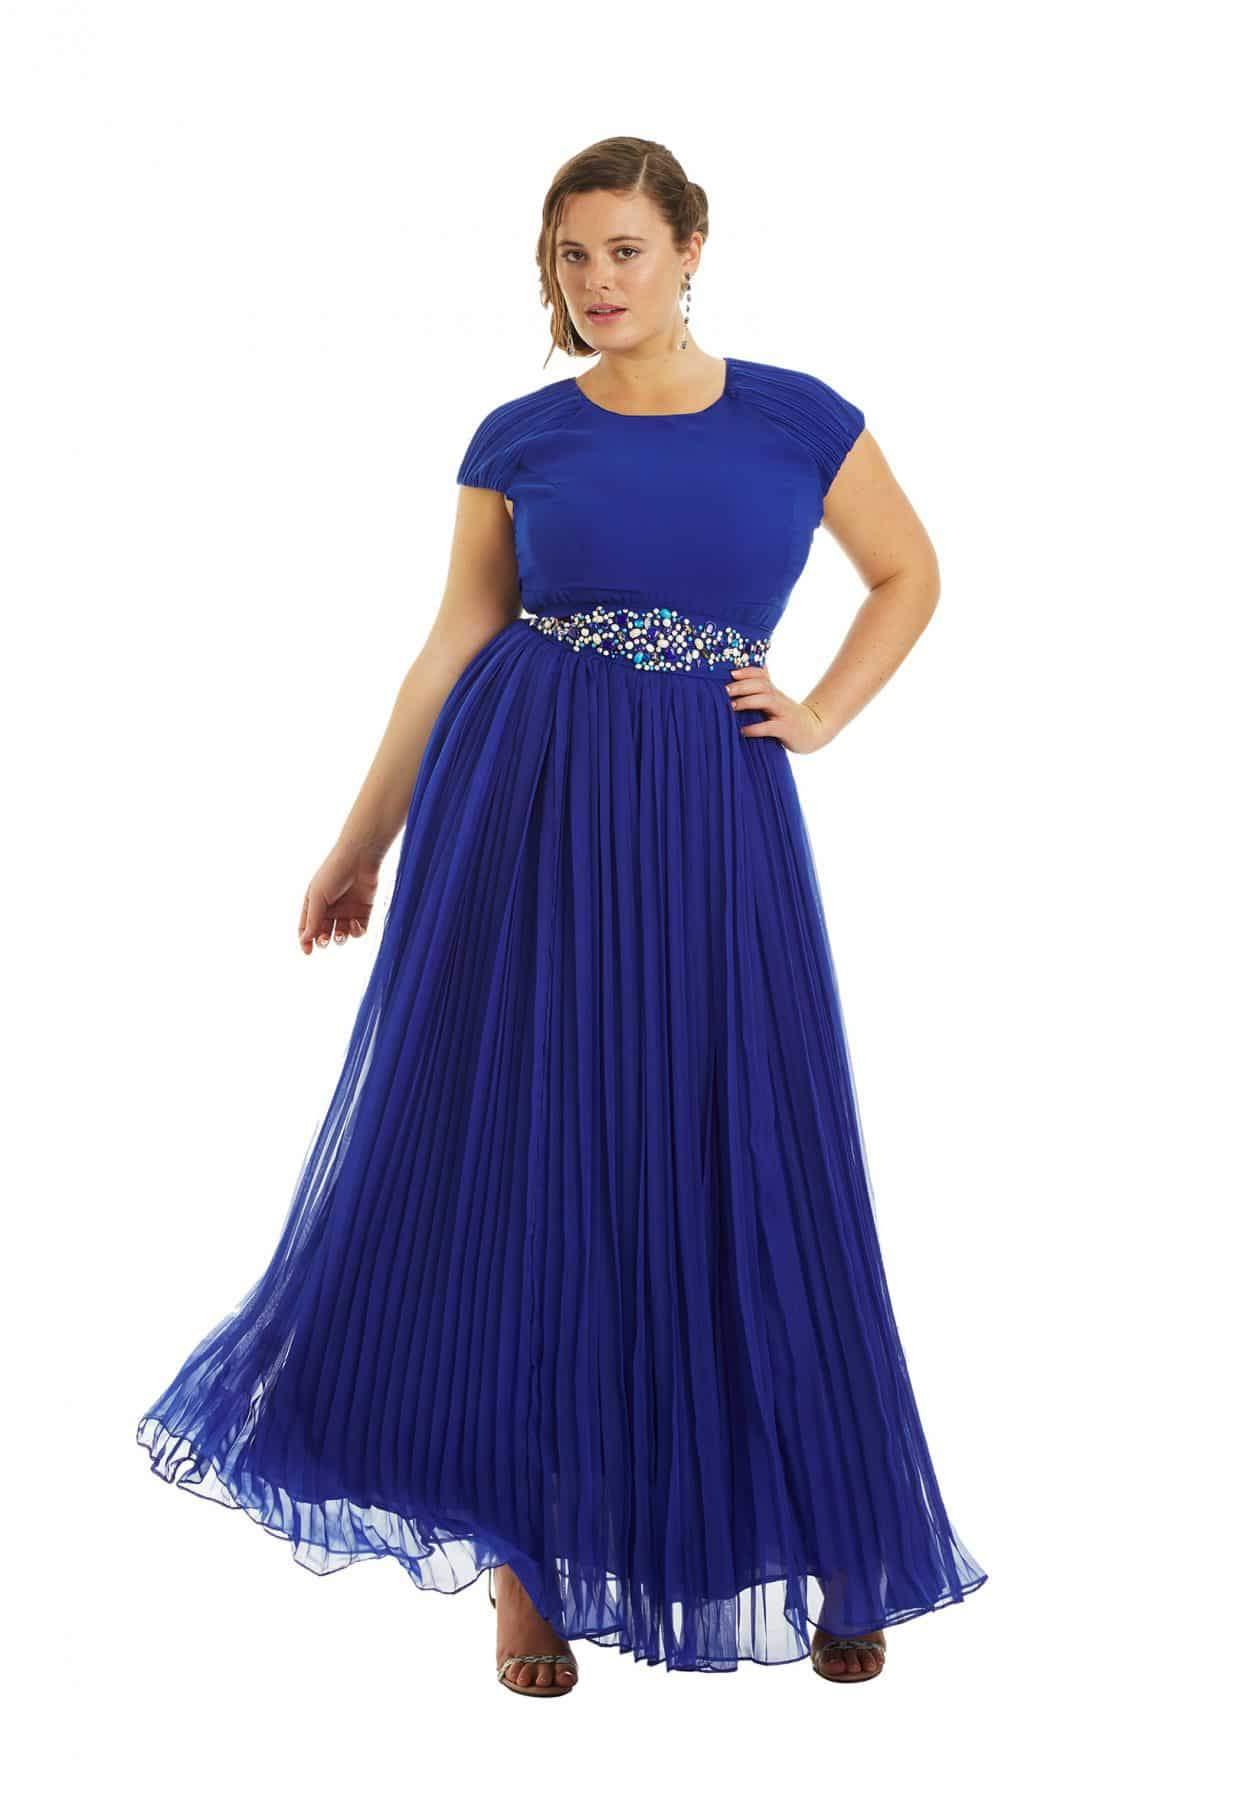 Dorothy Plus Size Prom Dress